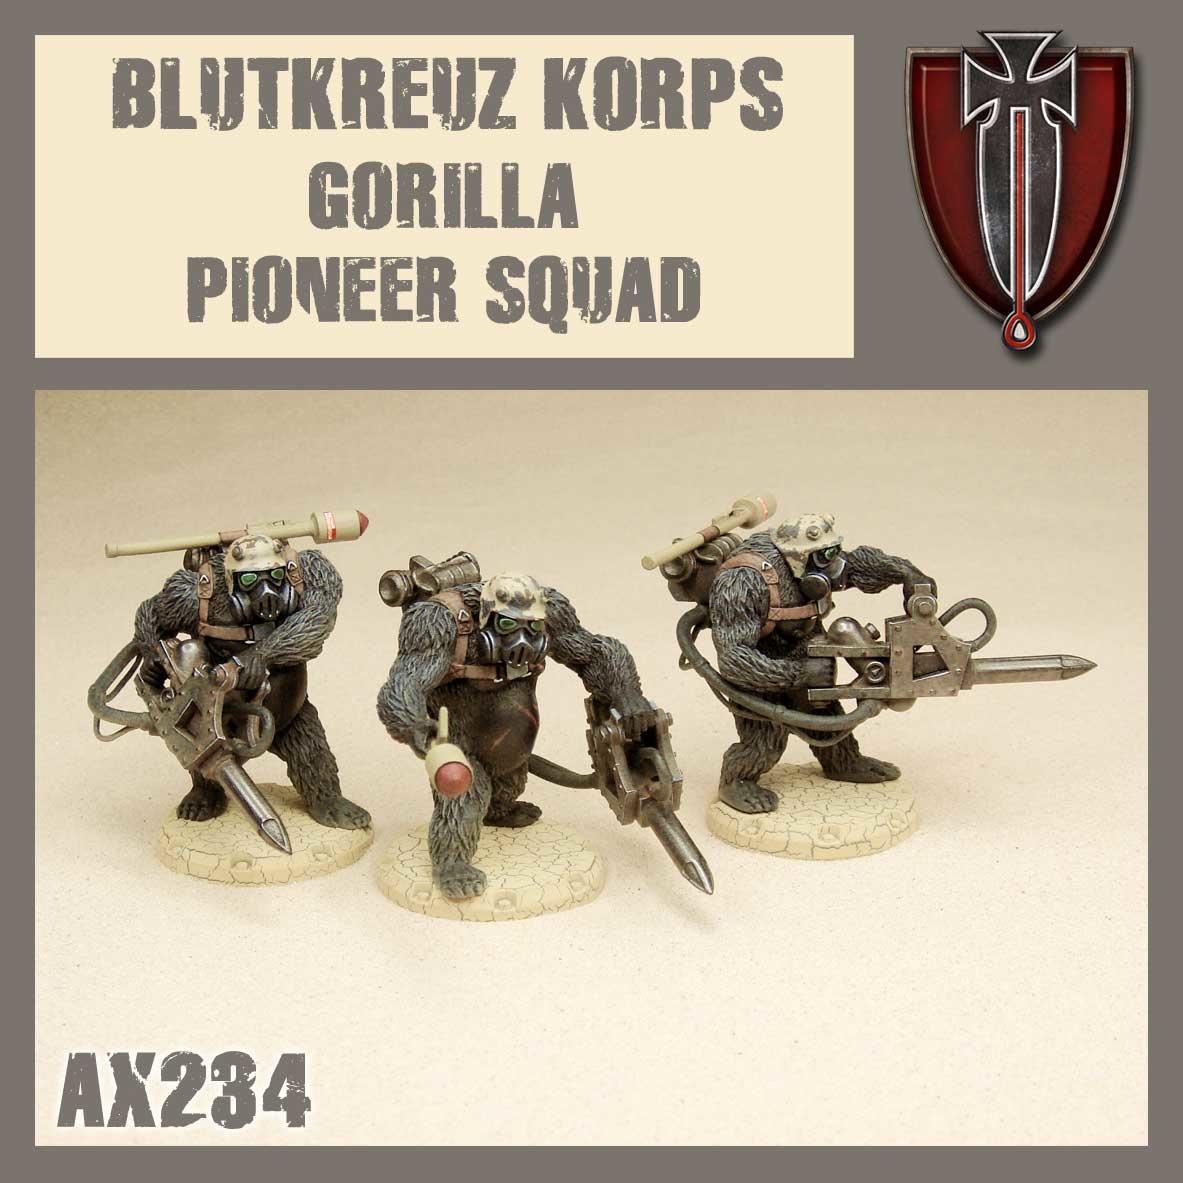 DUST USA DUST DROP-SHIP: Blutkreuz Korps Gorilla Pioneer Squad